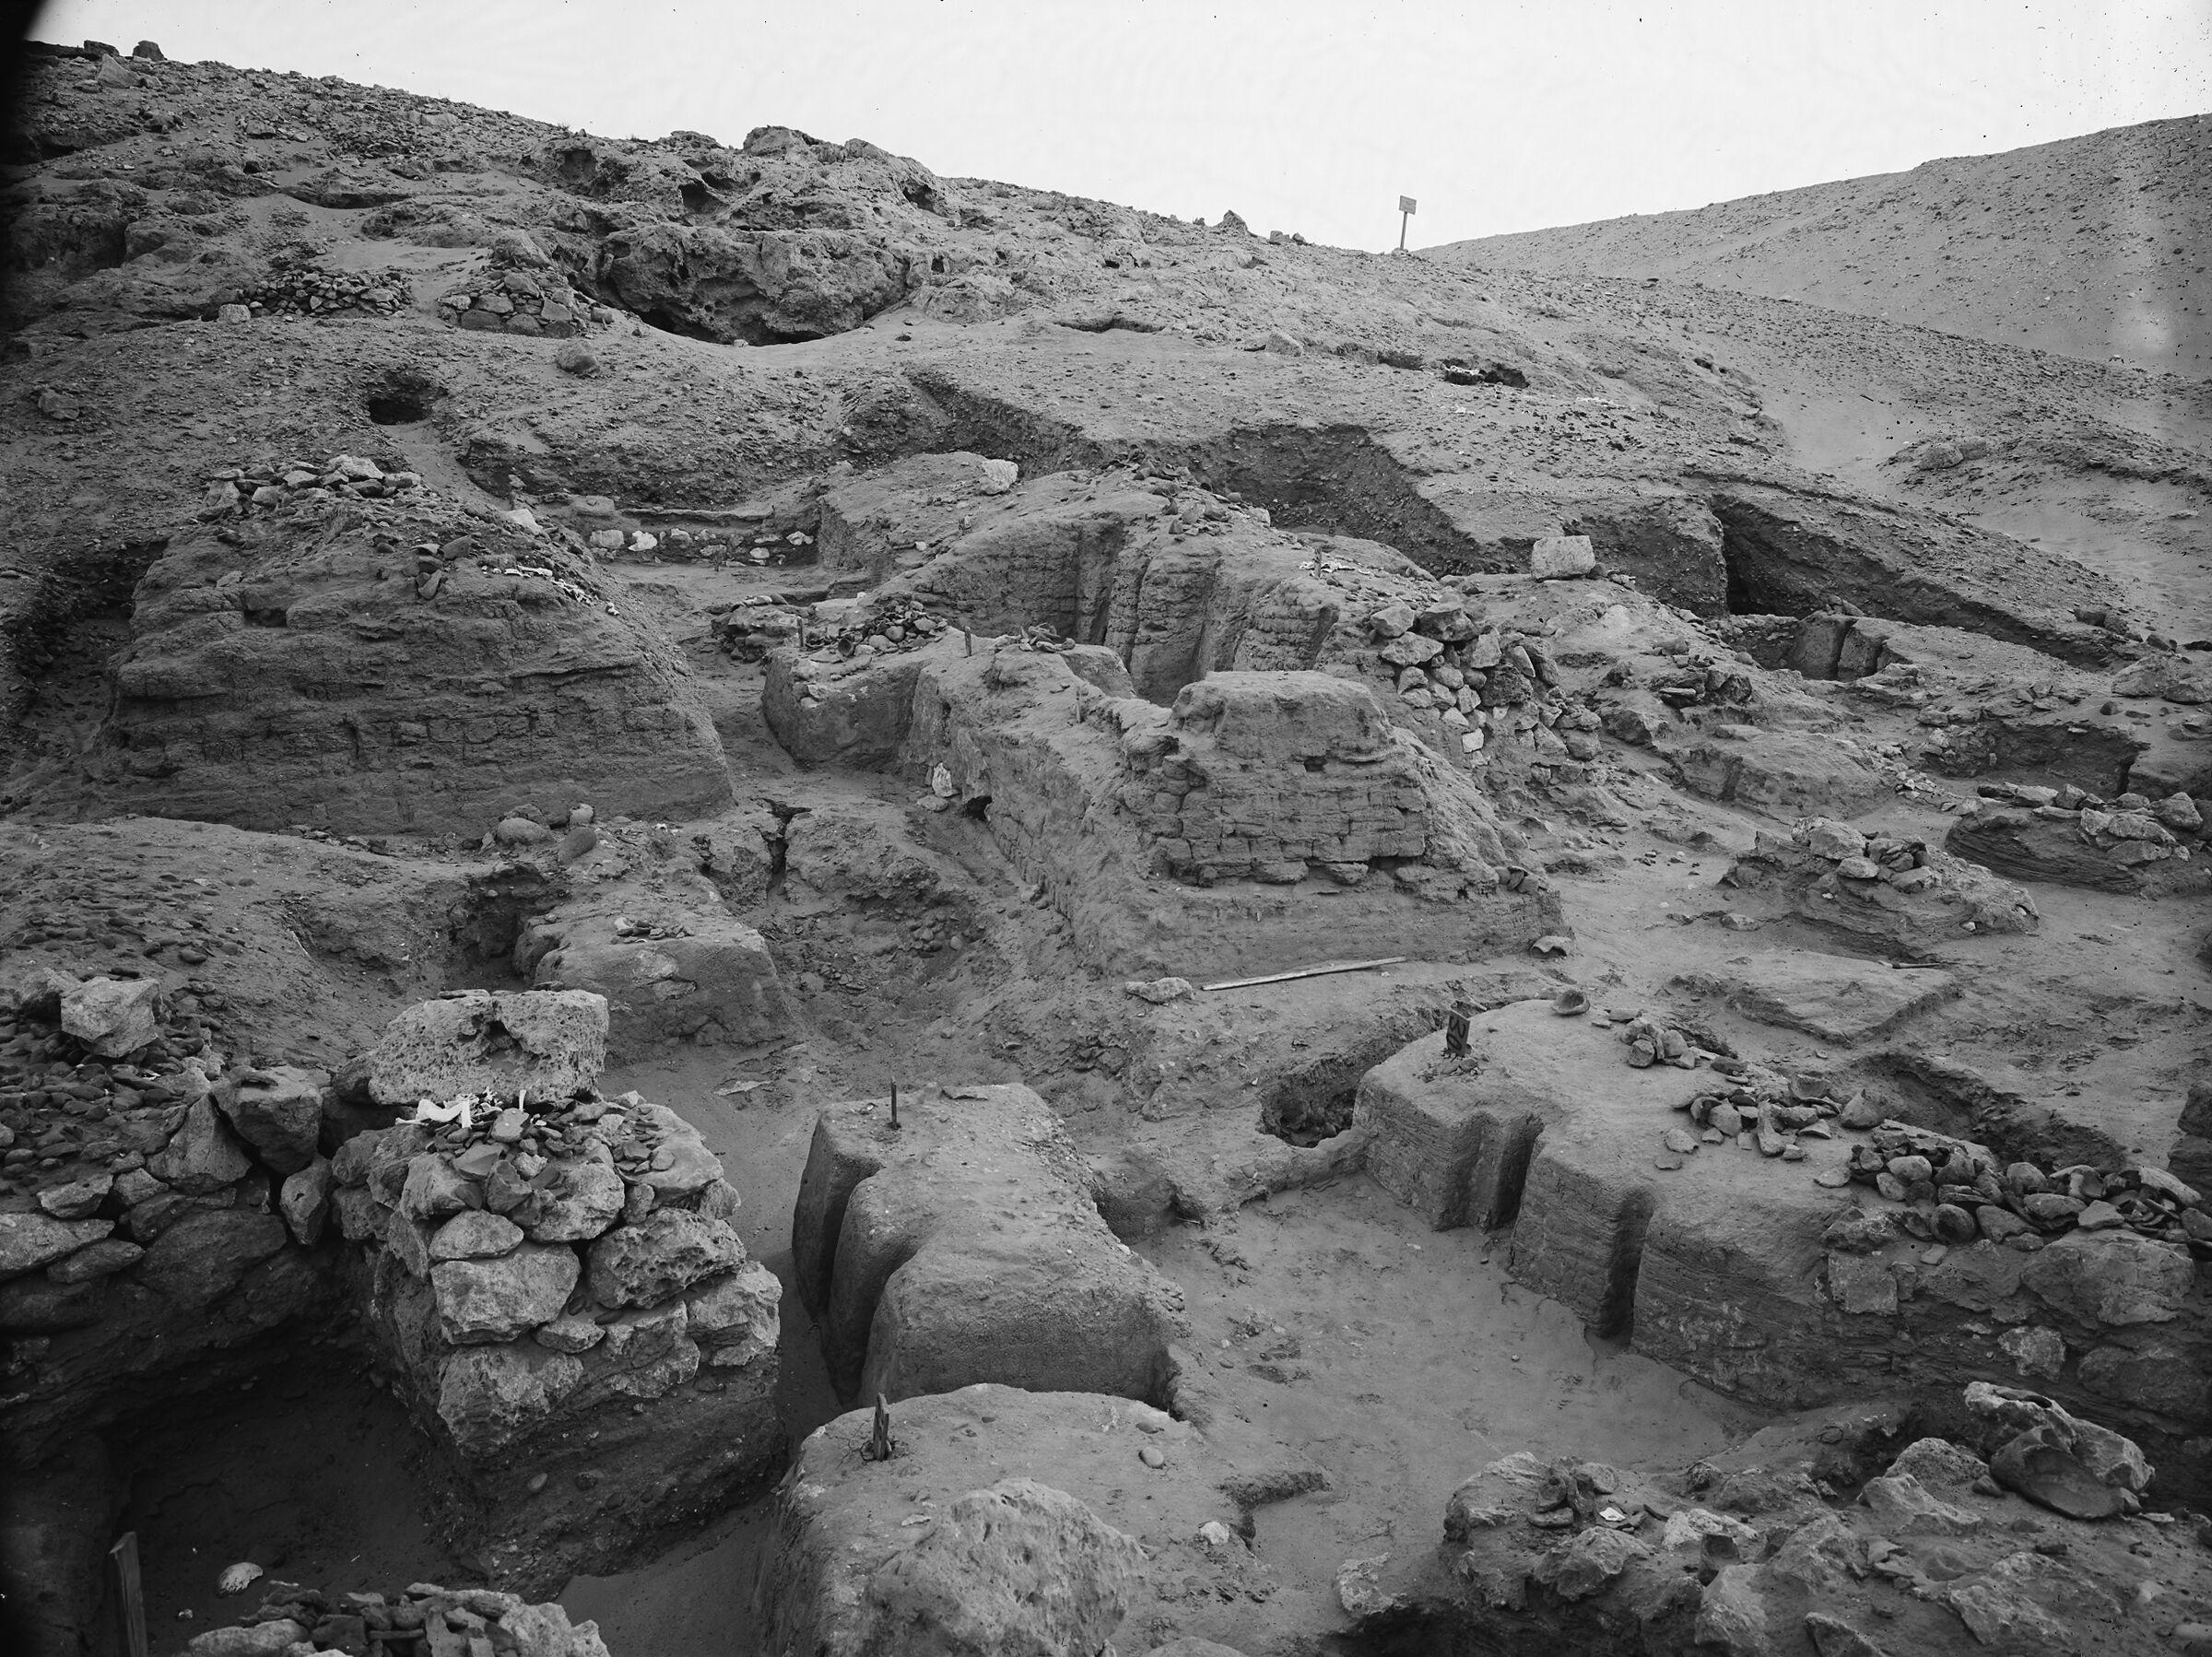 Wadi Cemetery (Reisner; north of W. Cem): Site: Giza; View: GW 16, GW 19, GW 20, GW 22, GW 29, GW 30, GW 31, GW 32, GW 33, GW 34, GW 35, GW 36, GW 37, GW 38, GW 46, GW 47, GW 56